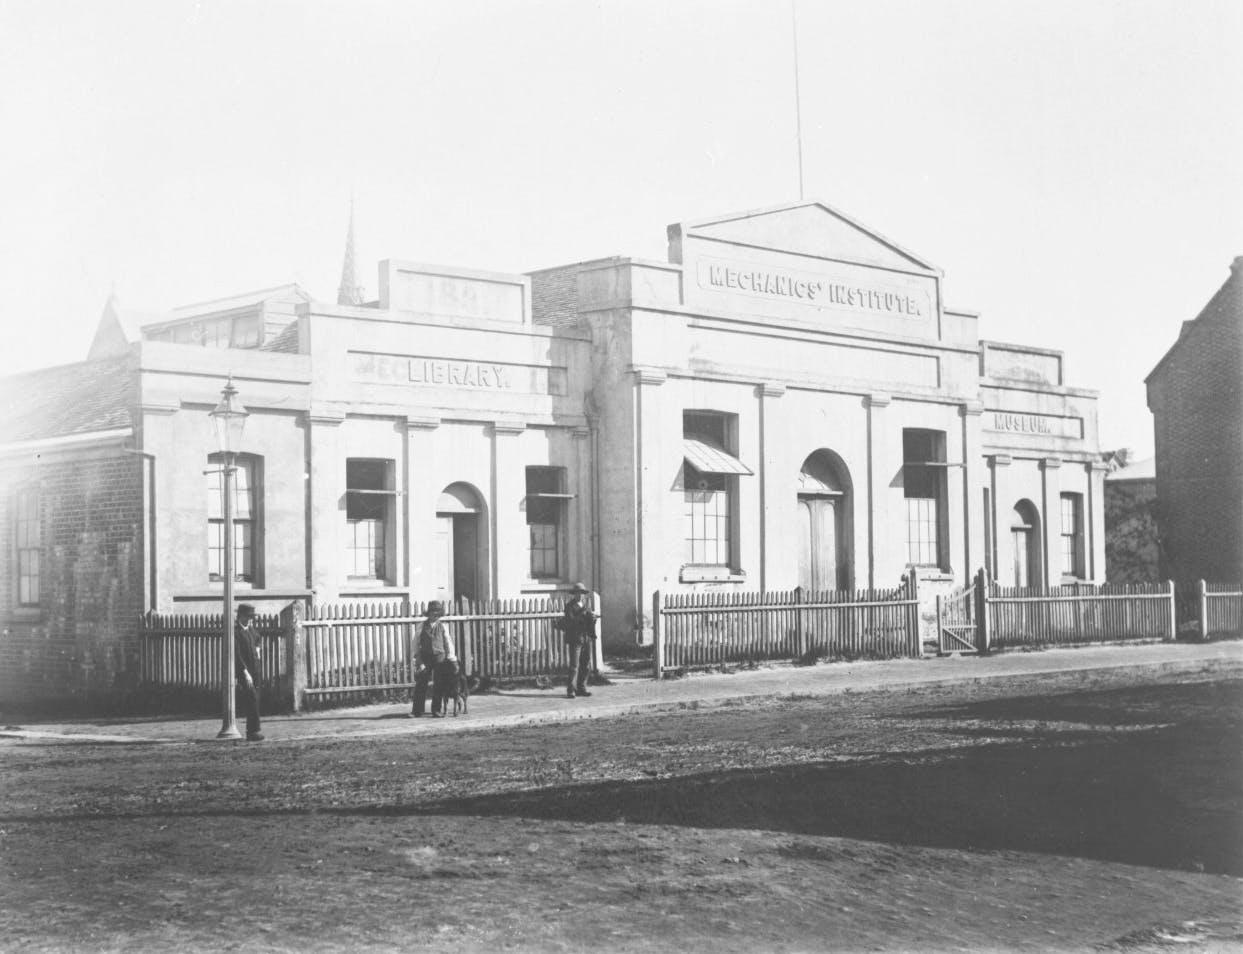 Hay Street - Swan River Mechanics Institute - 1880's